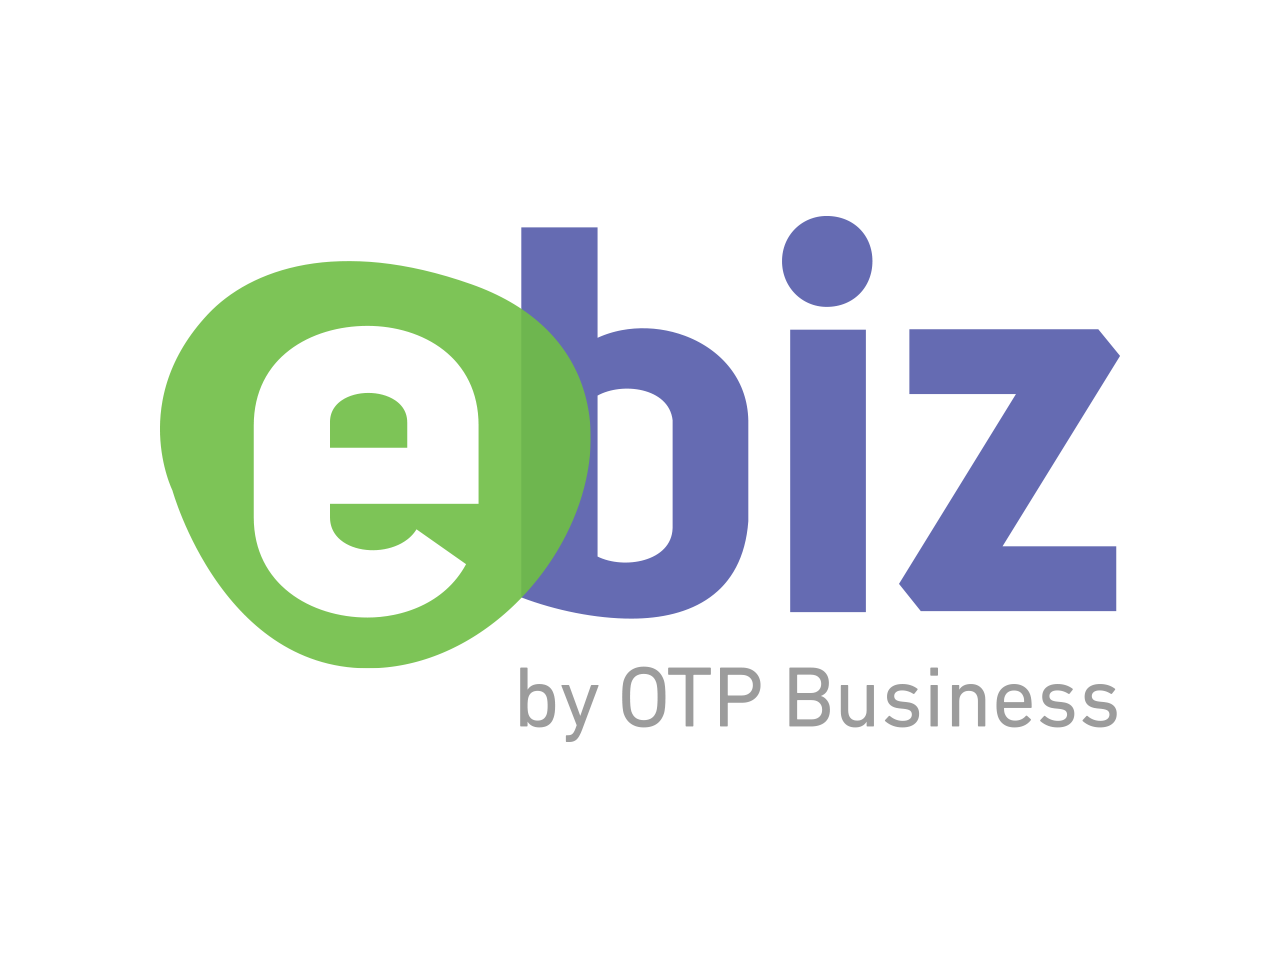 ebiz_logo_rgb_high.png